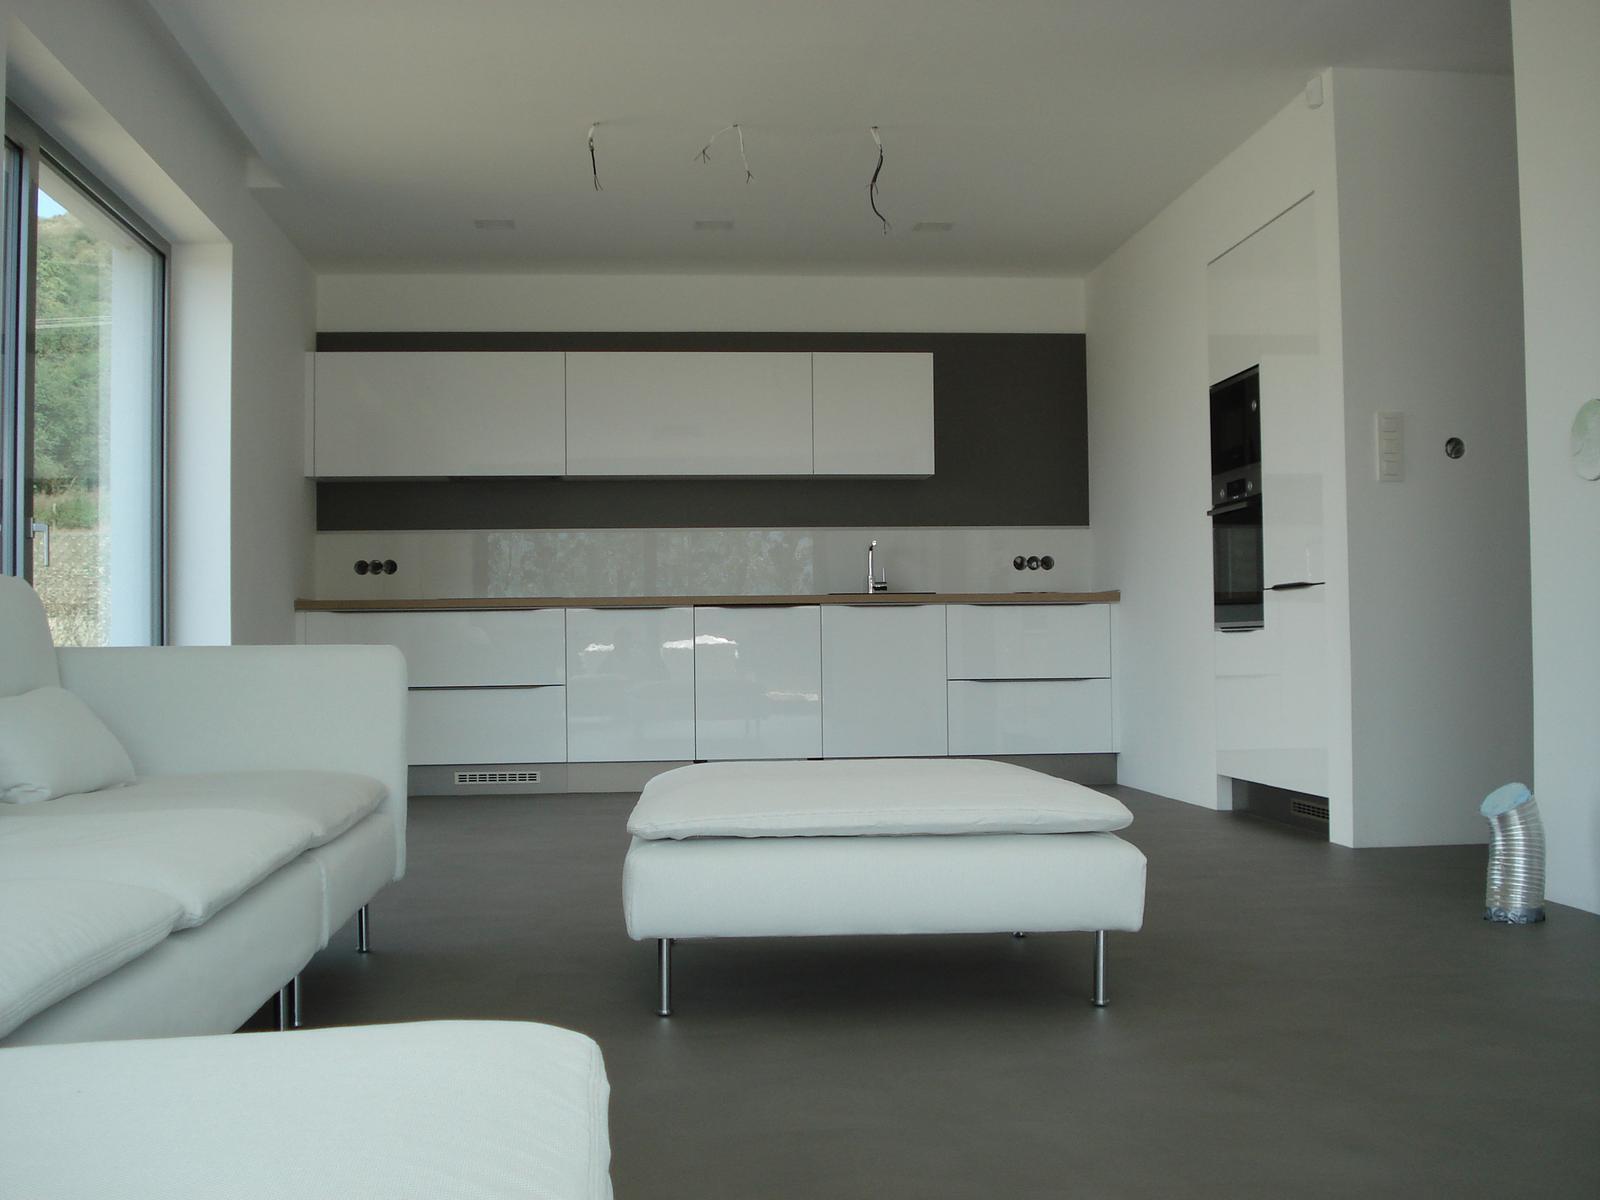 Dom LM - Obrázok č. 120